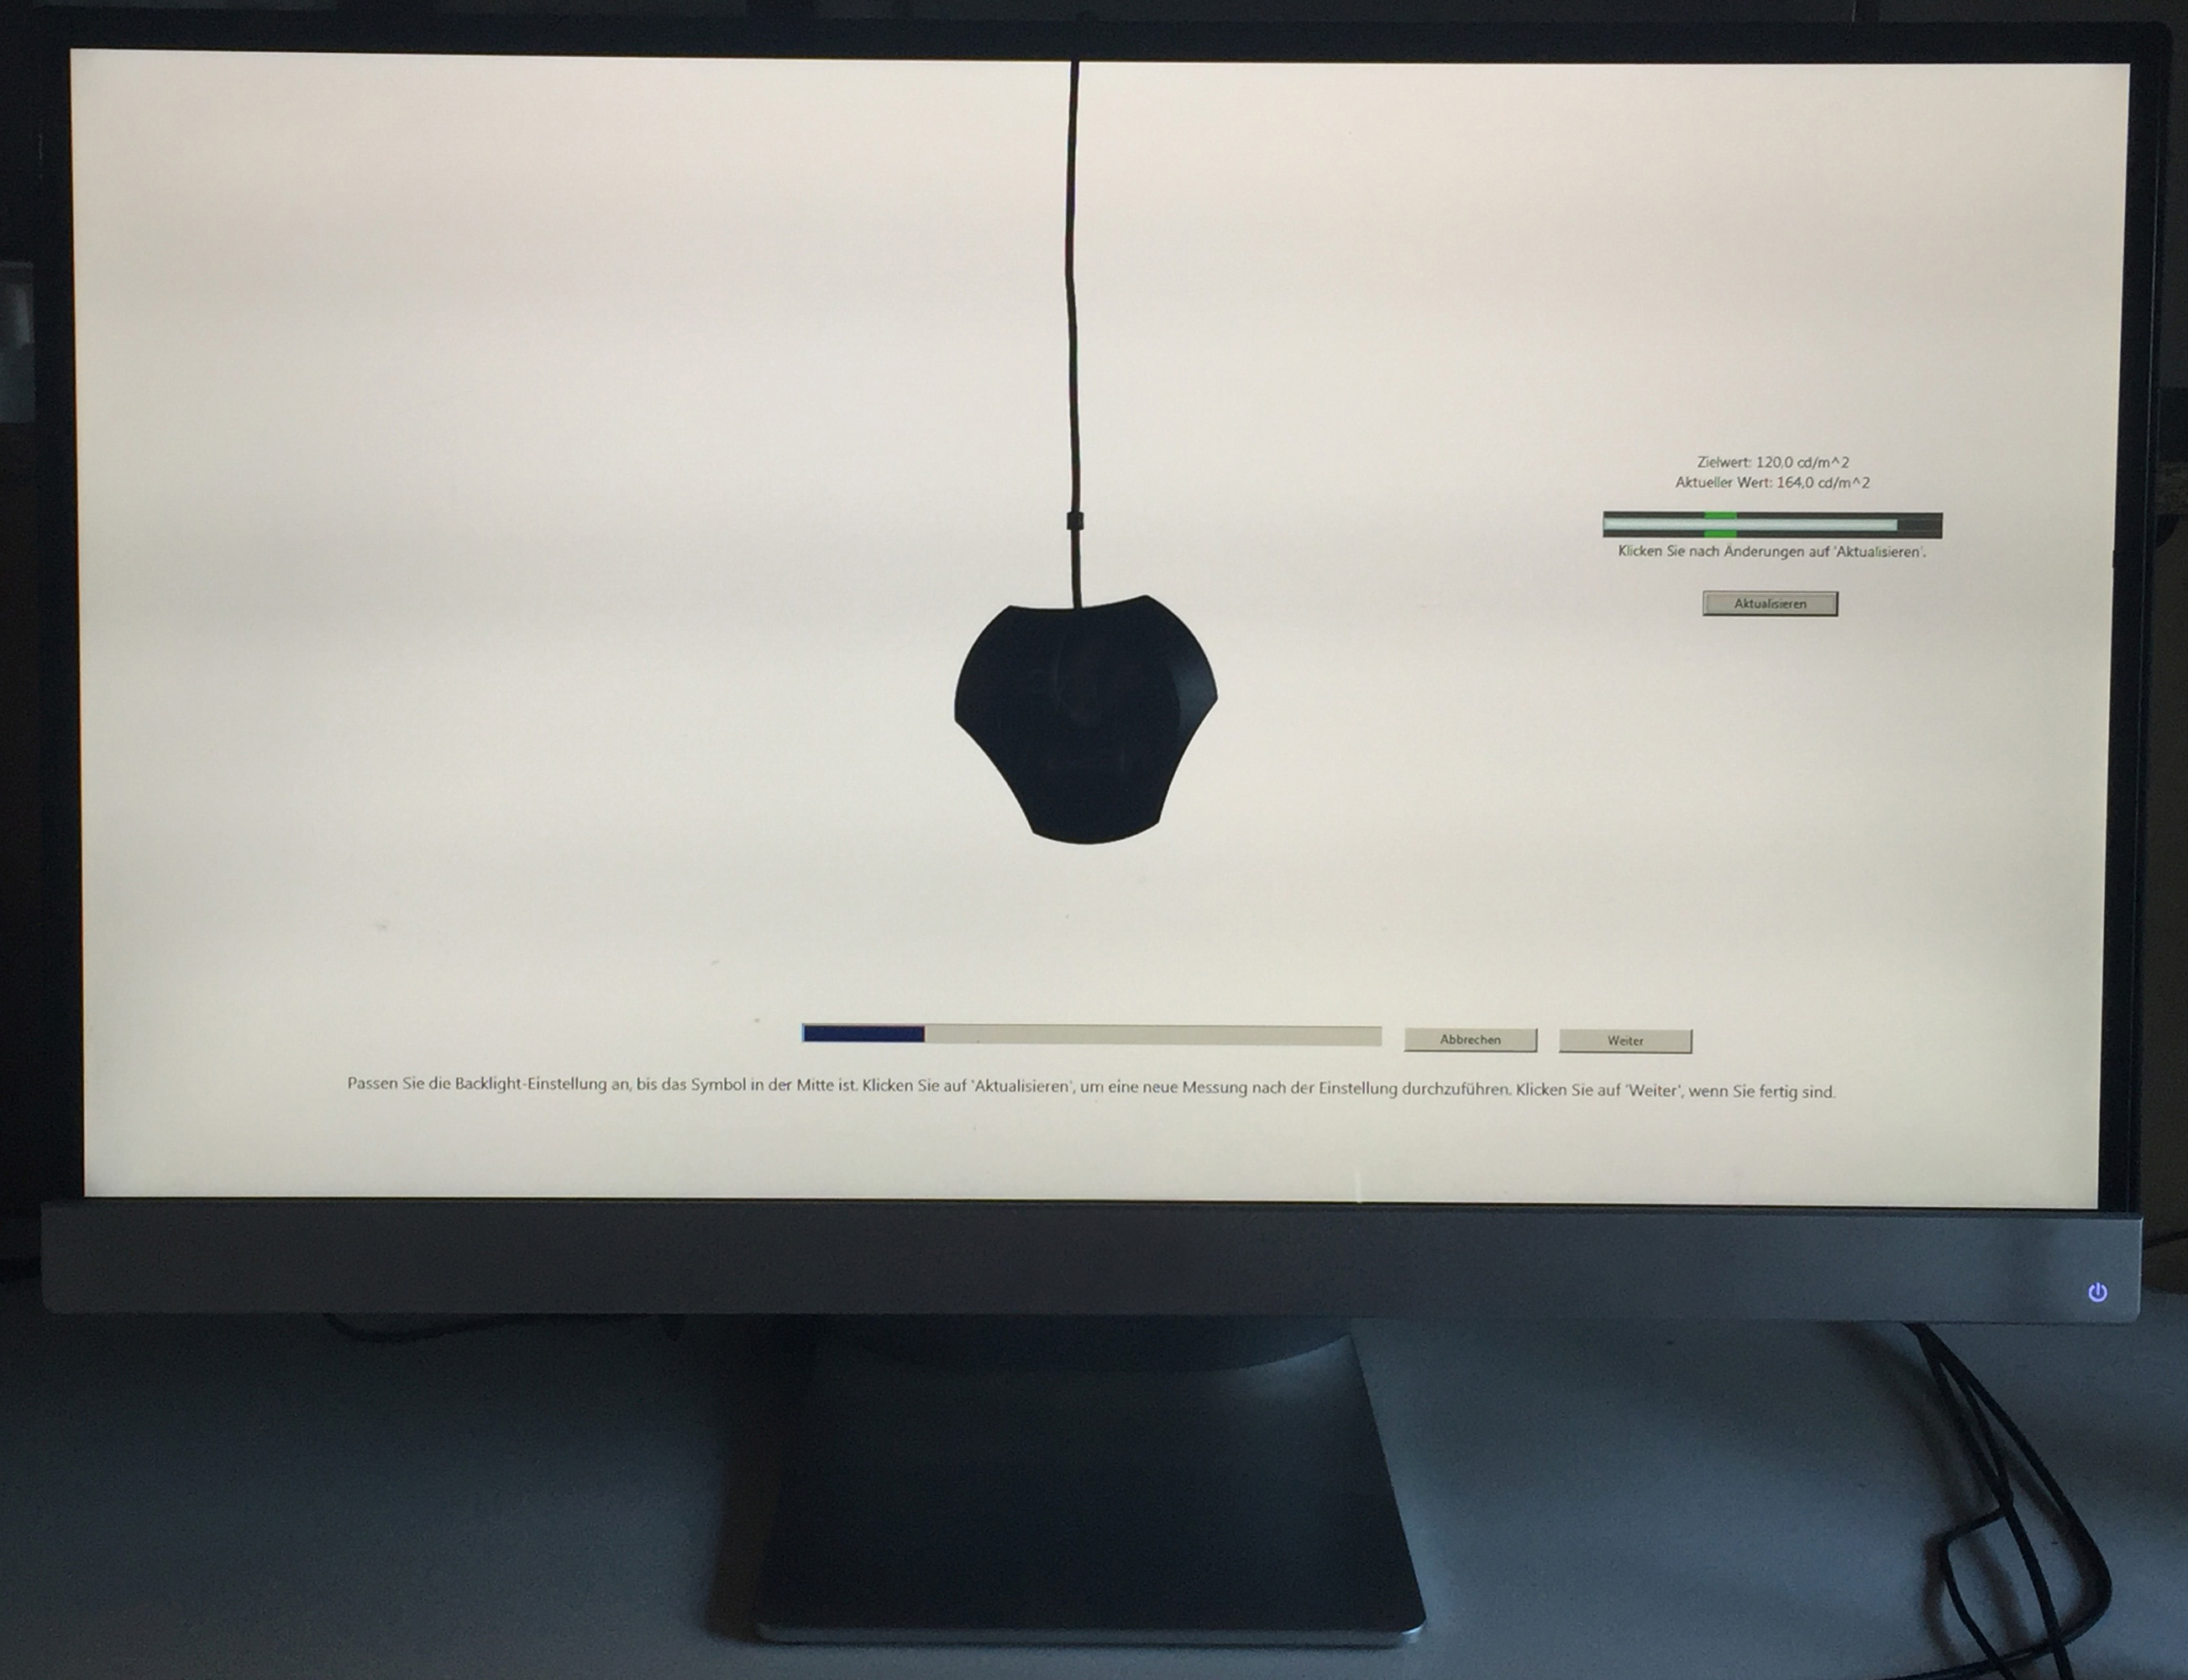 Monitore kalibrieren mit Kolorimeter